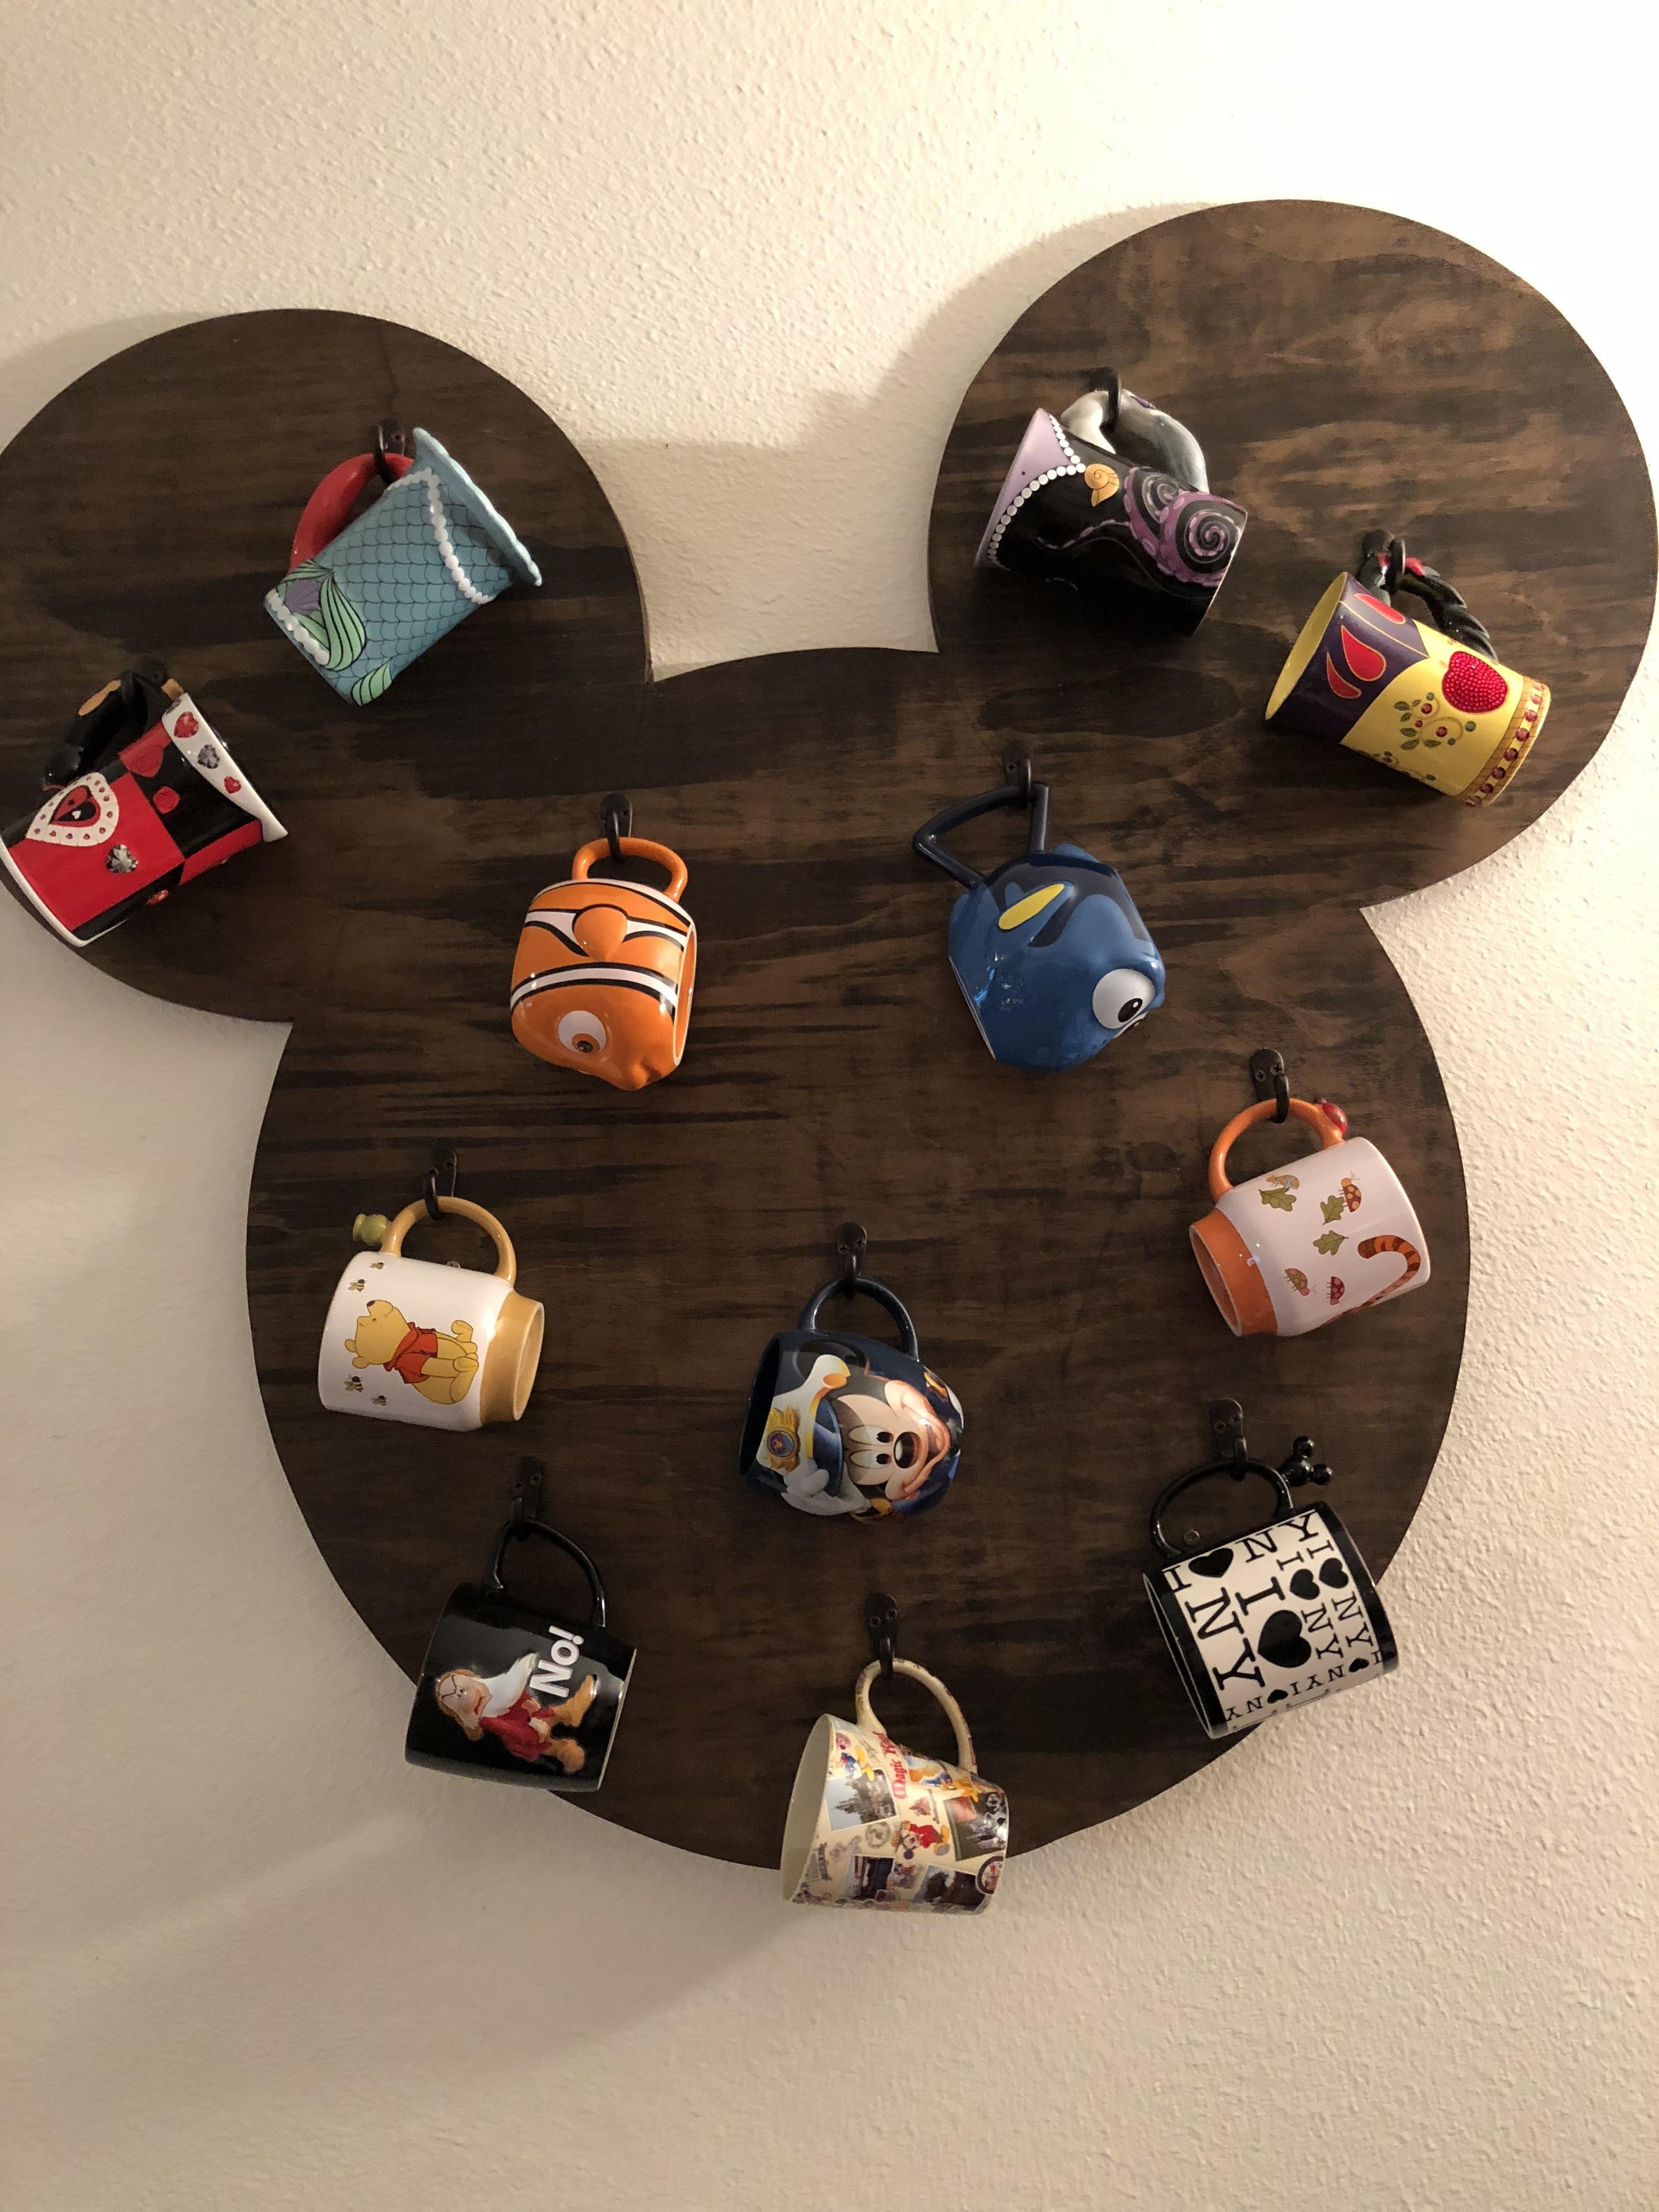 Disney Mug Rack Disney Decor Disney Decor Diy Disney Home Decor